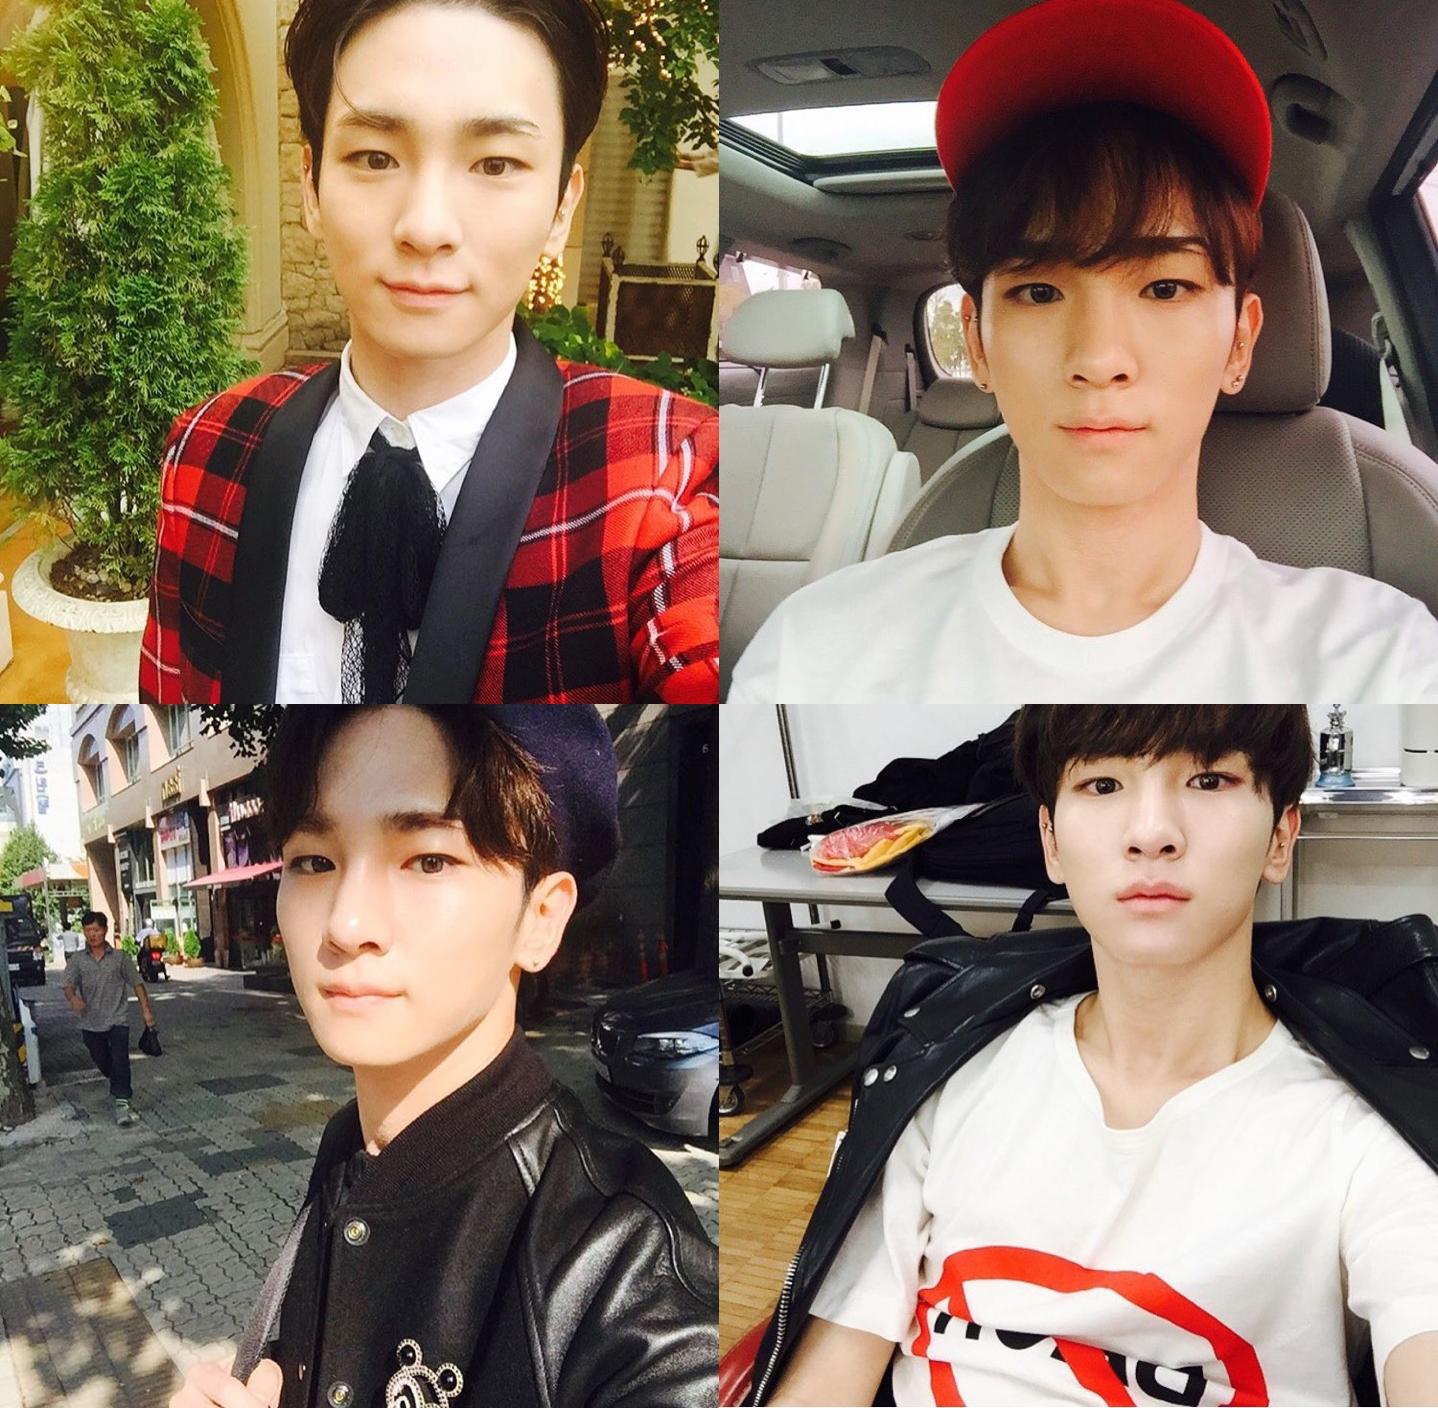 ★ SHINee :: KEY ★  KEY 不僅很有時尚品味,就連拍照也很有自己的感覺,有人跟我一樣很喜歡看他拍穿搭照嗎?(舉手)